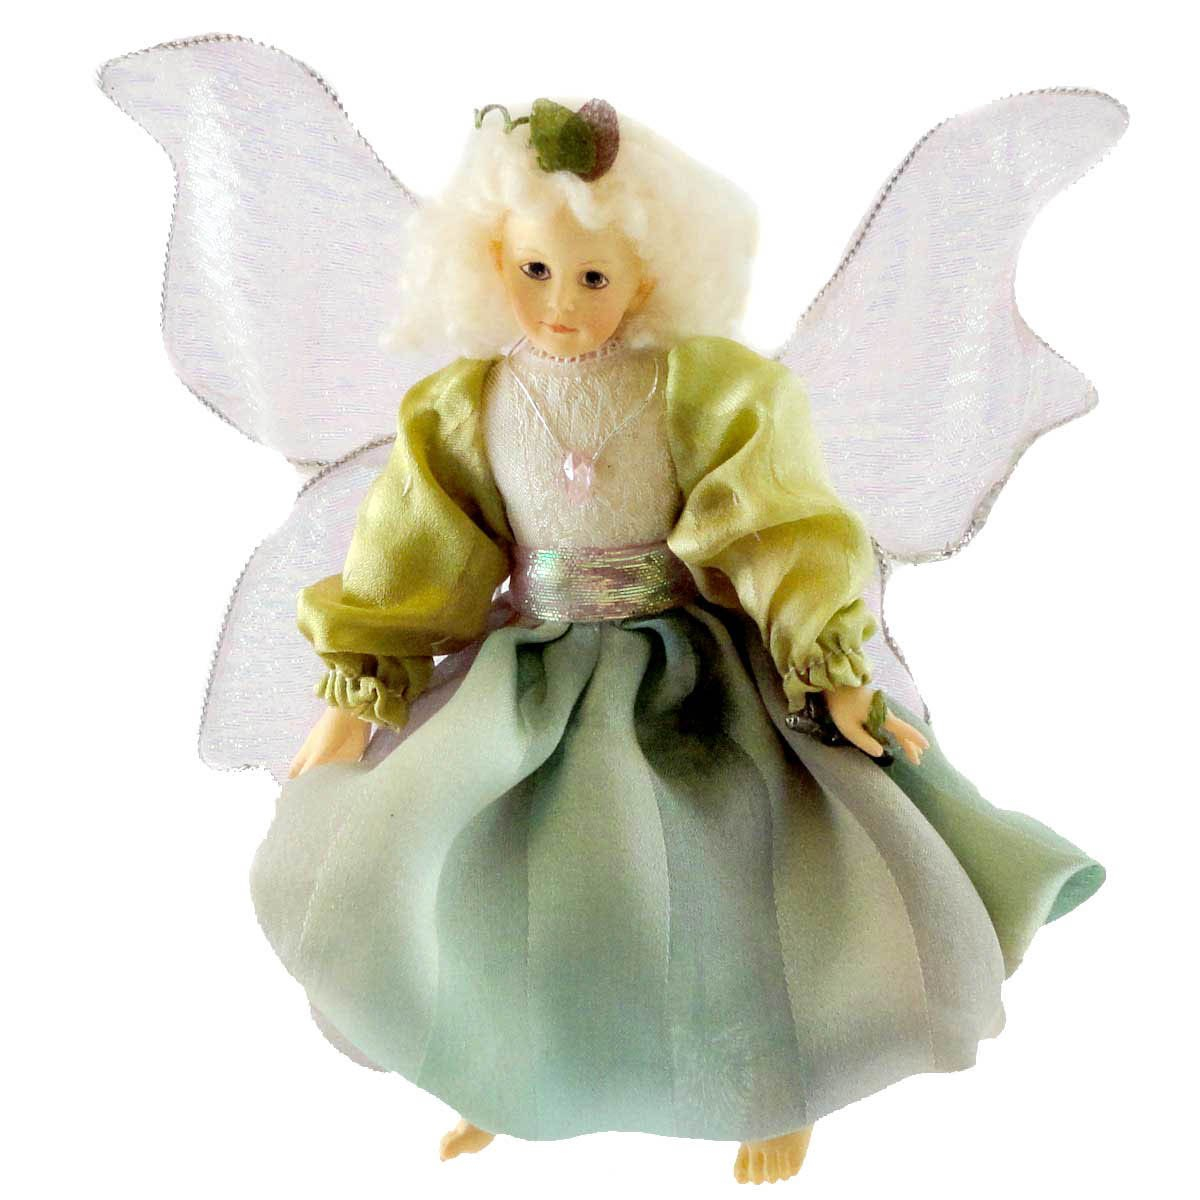 Boyds Bears Resin Irridessa Faerielocket Fairy Whispers - Resin & Fabric 5.00 IN